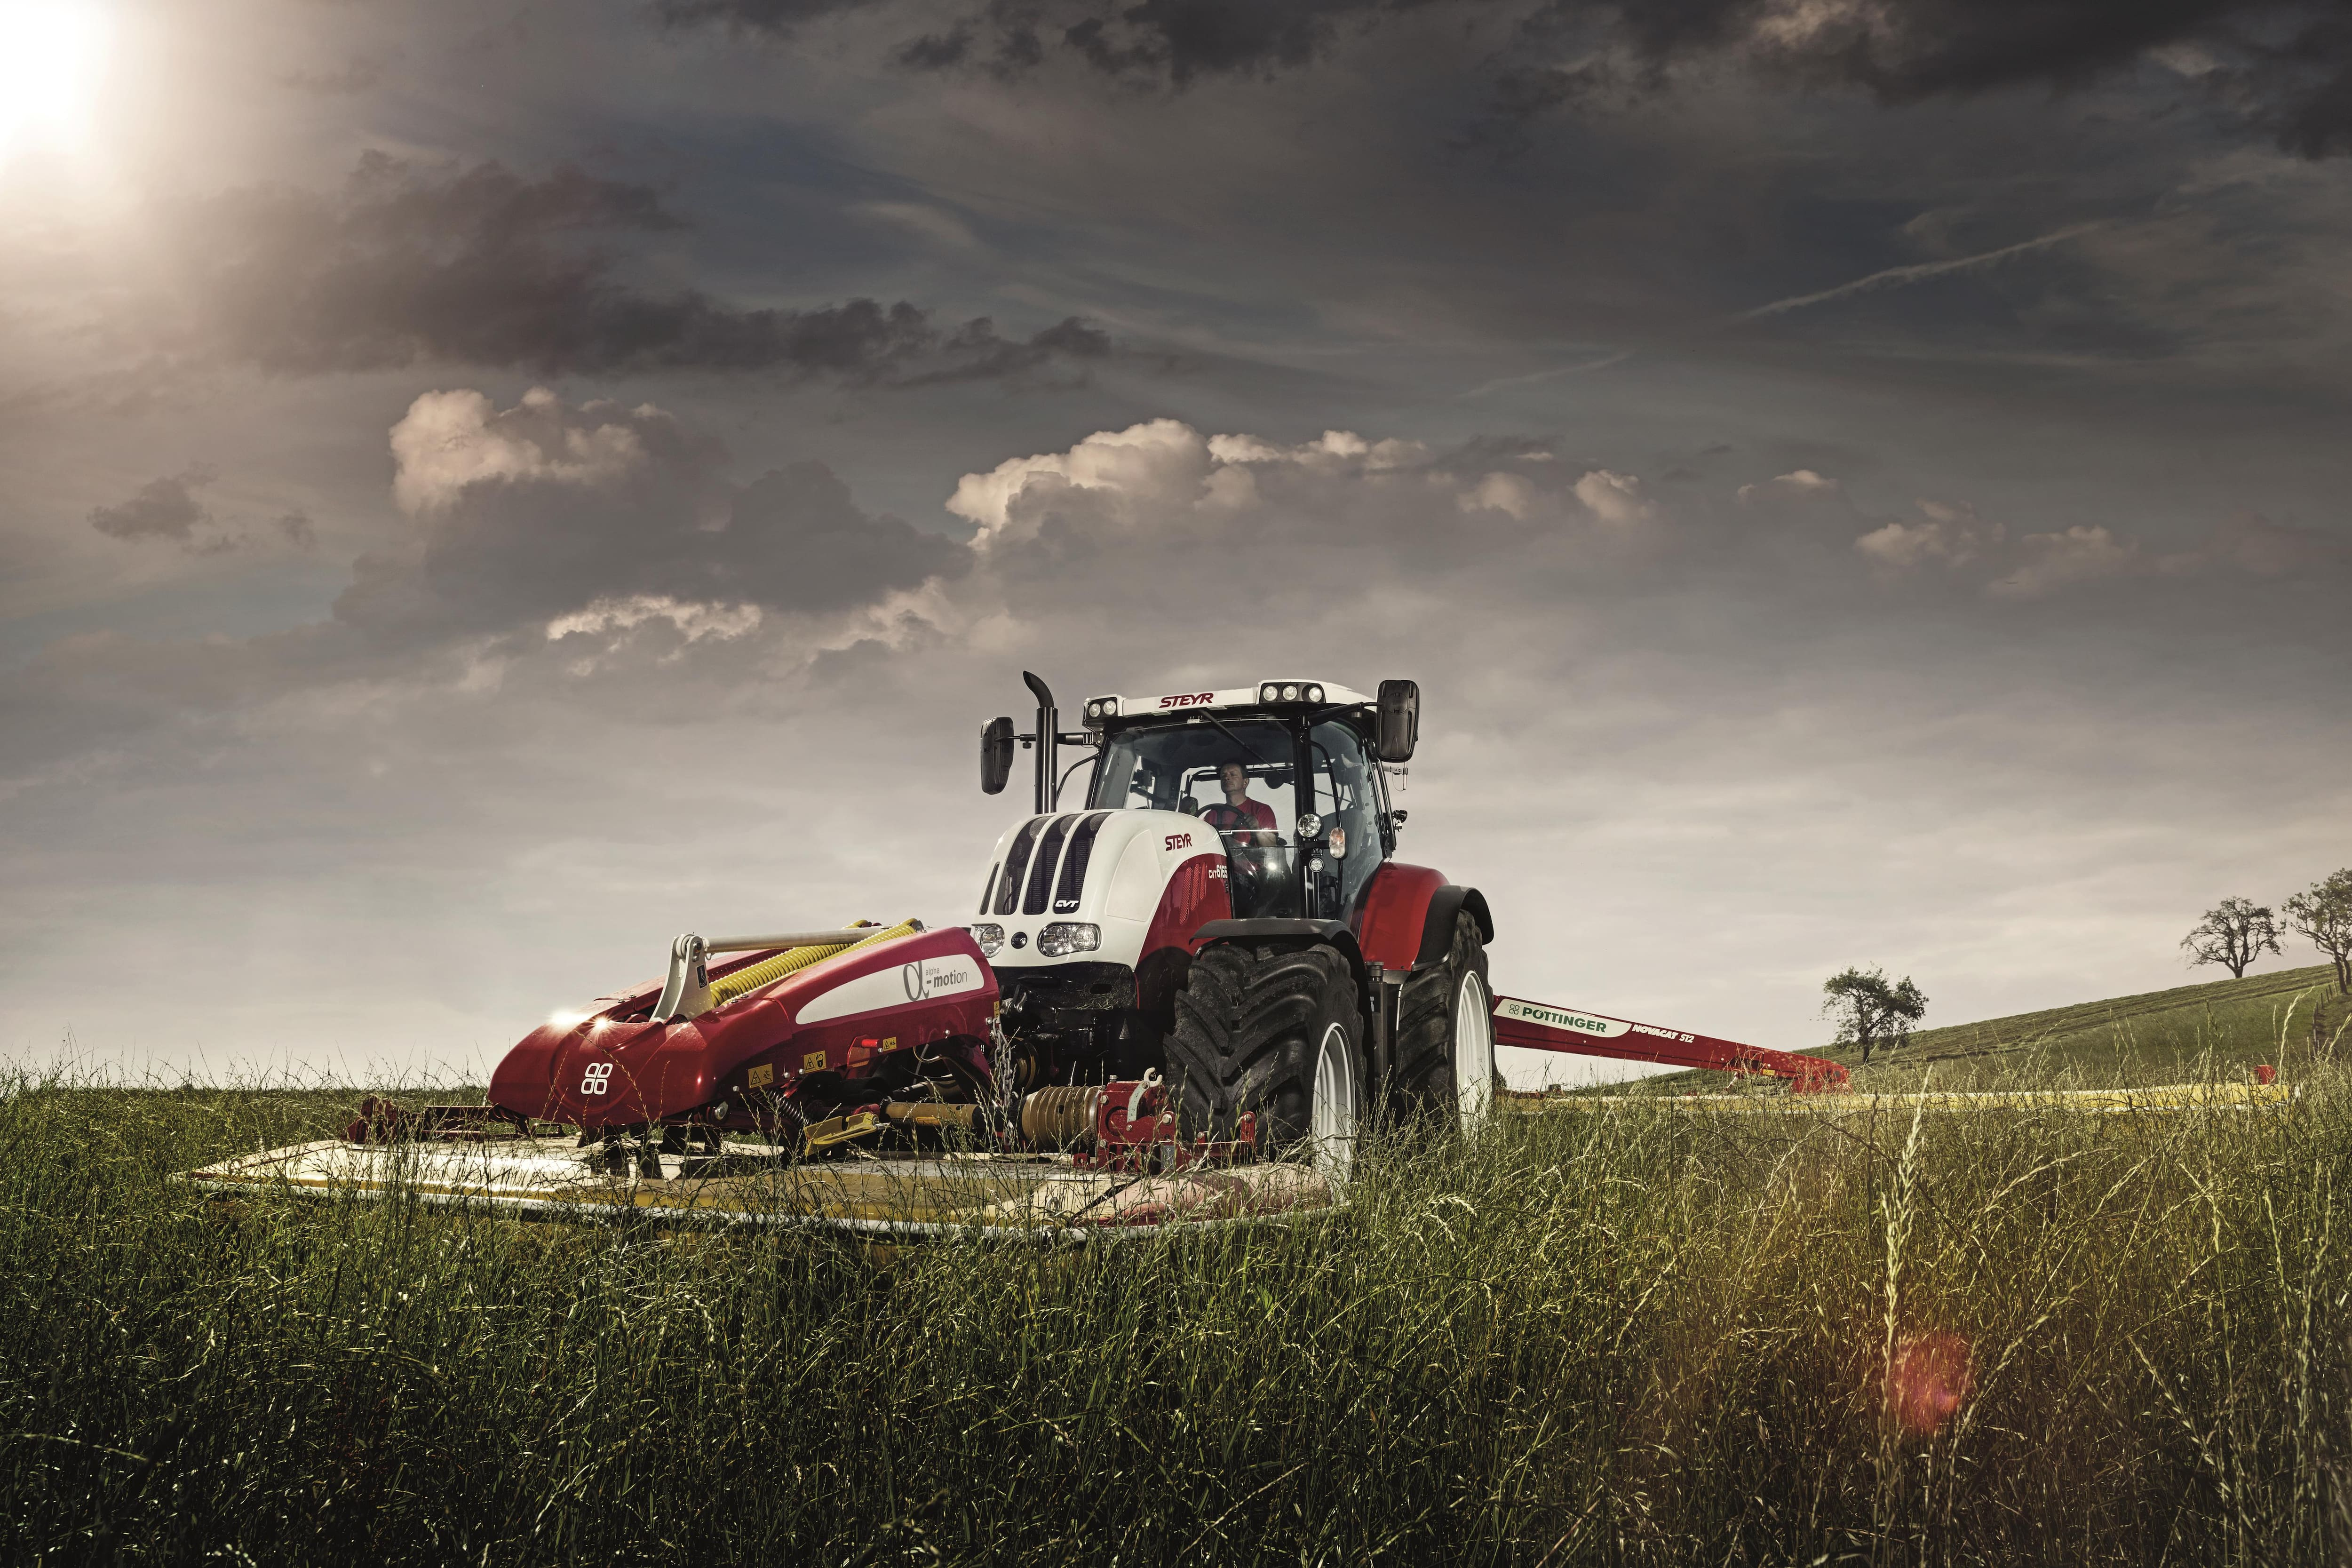 STEYR 22 STEYR KOMMUNAL ecotech Traktoren Prospekt